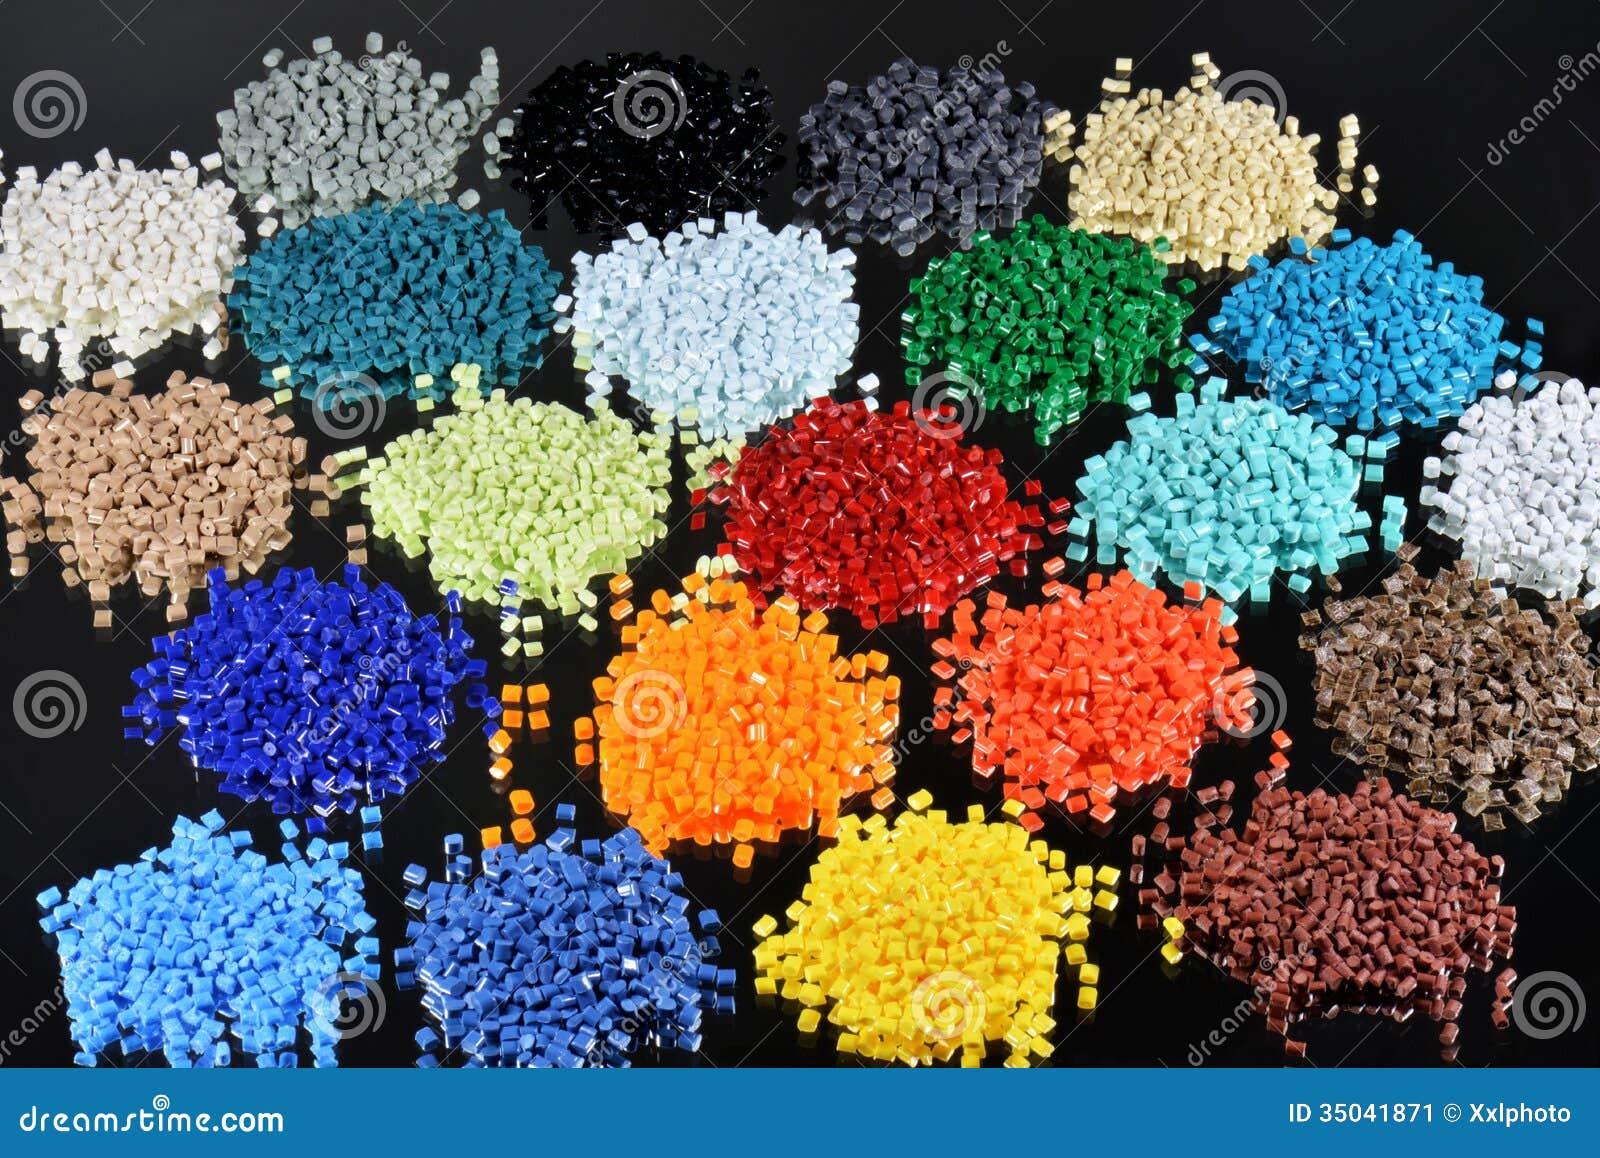 Dyed Polymer Resin Stock Image Image 35041871